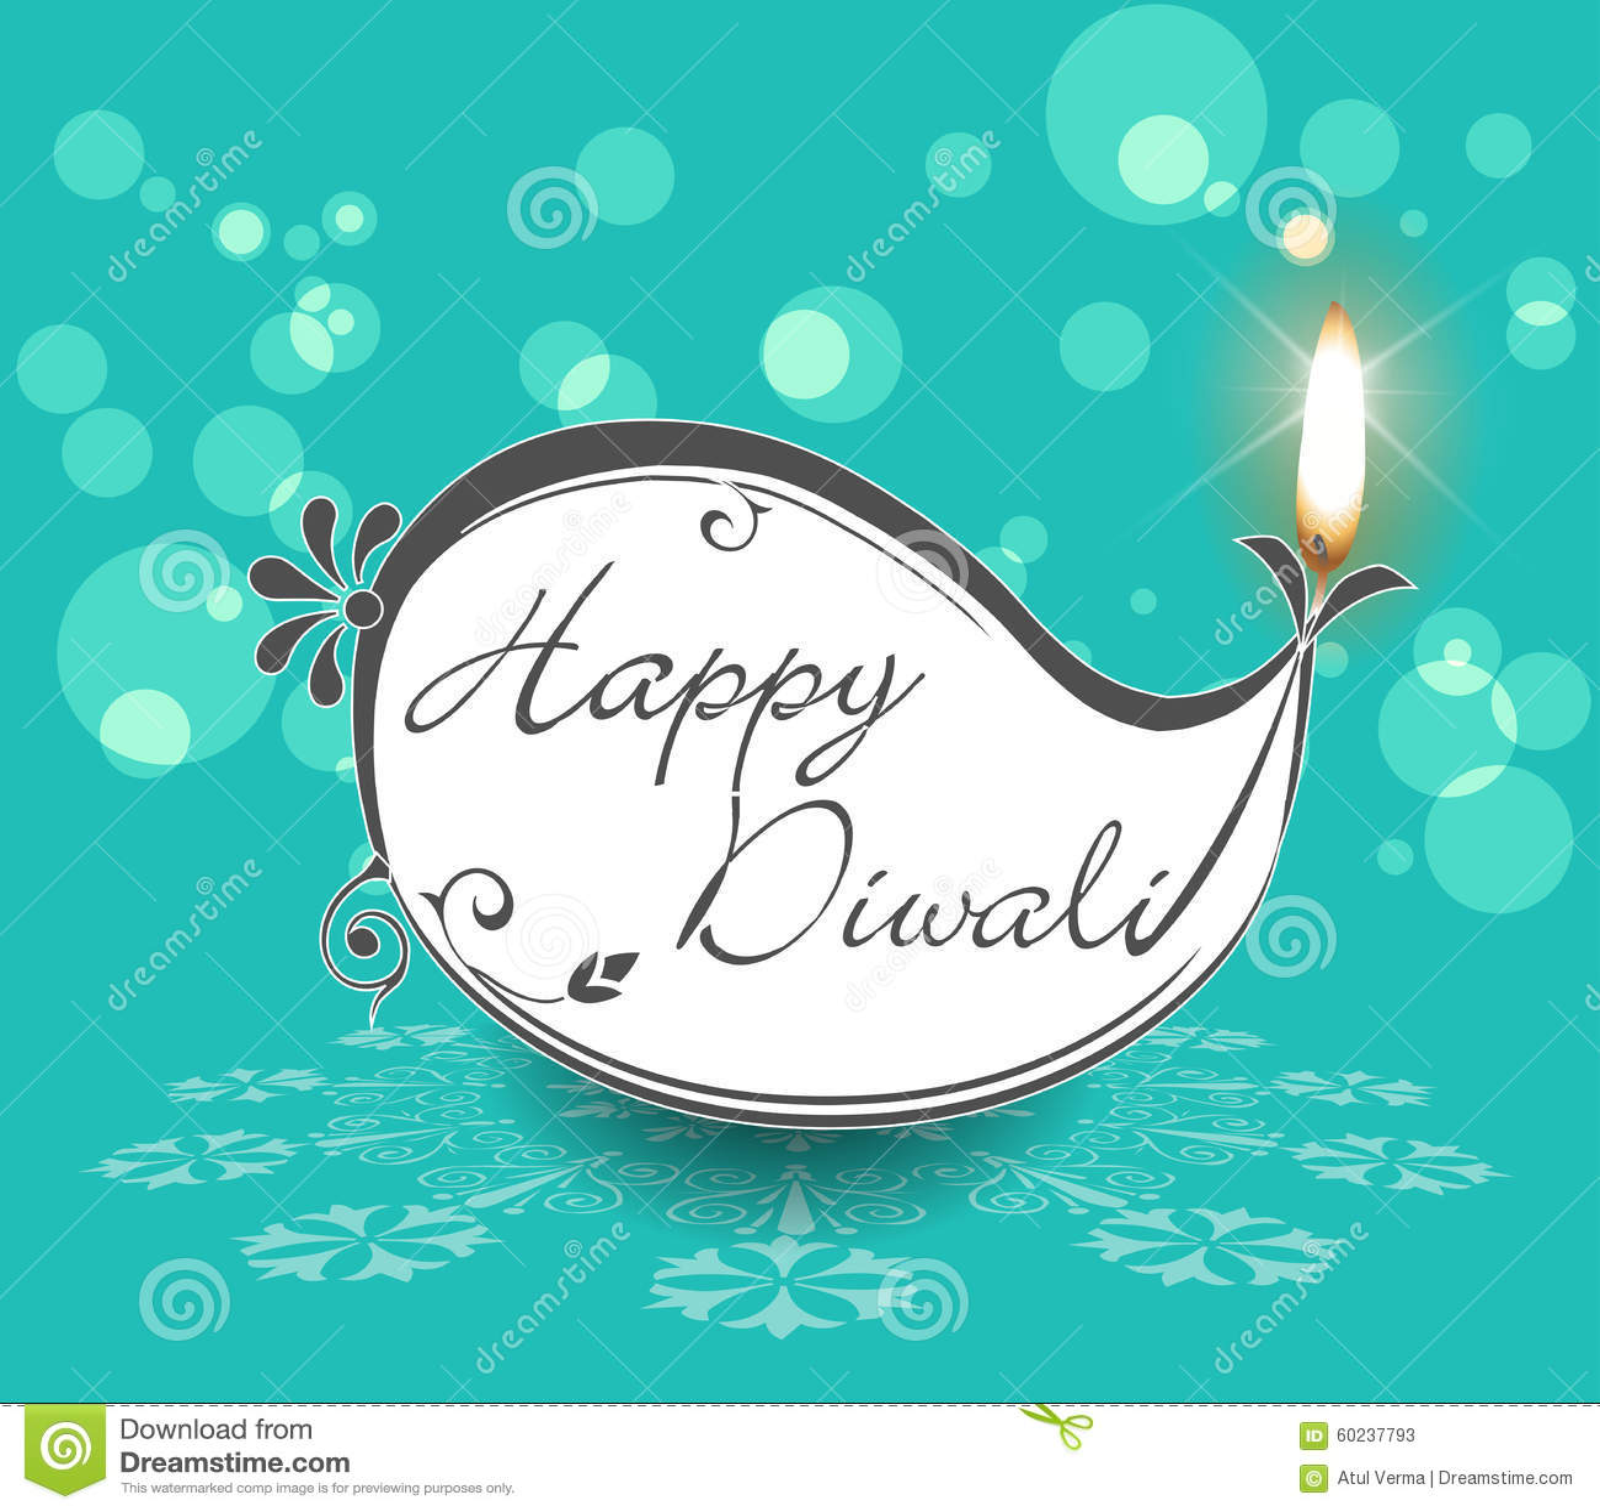 Decorative diwali lamps happy diwali greeting card flat design download decorative diwali lamps happy diwali greeting card flat design stock vector illustration of m4hsunfo